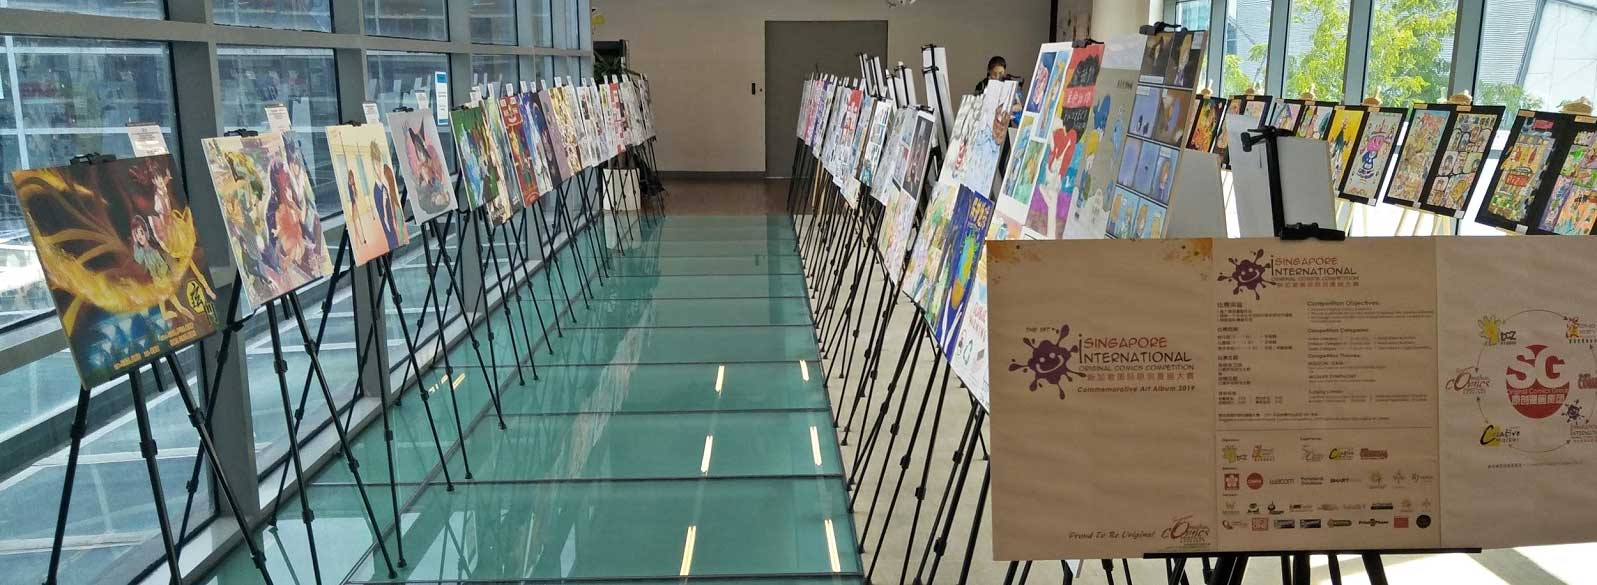 1 month-long Original art exhibition @ Jurong Regional Library Level 4 Sky Bridge.